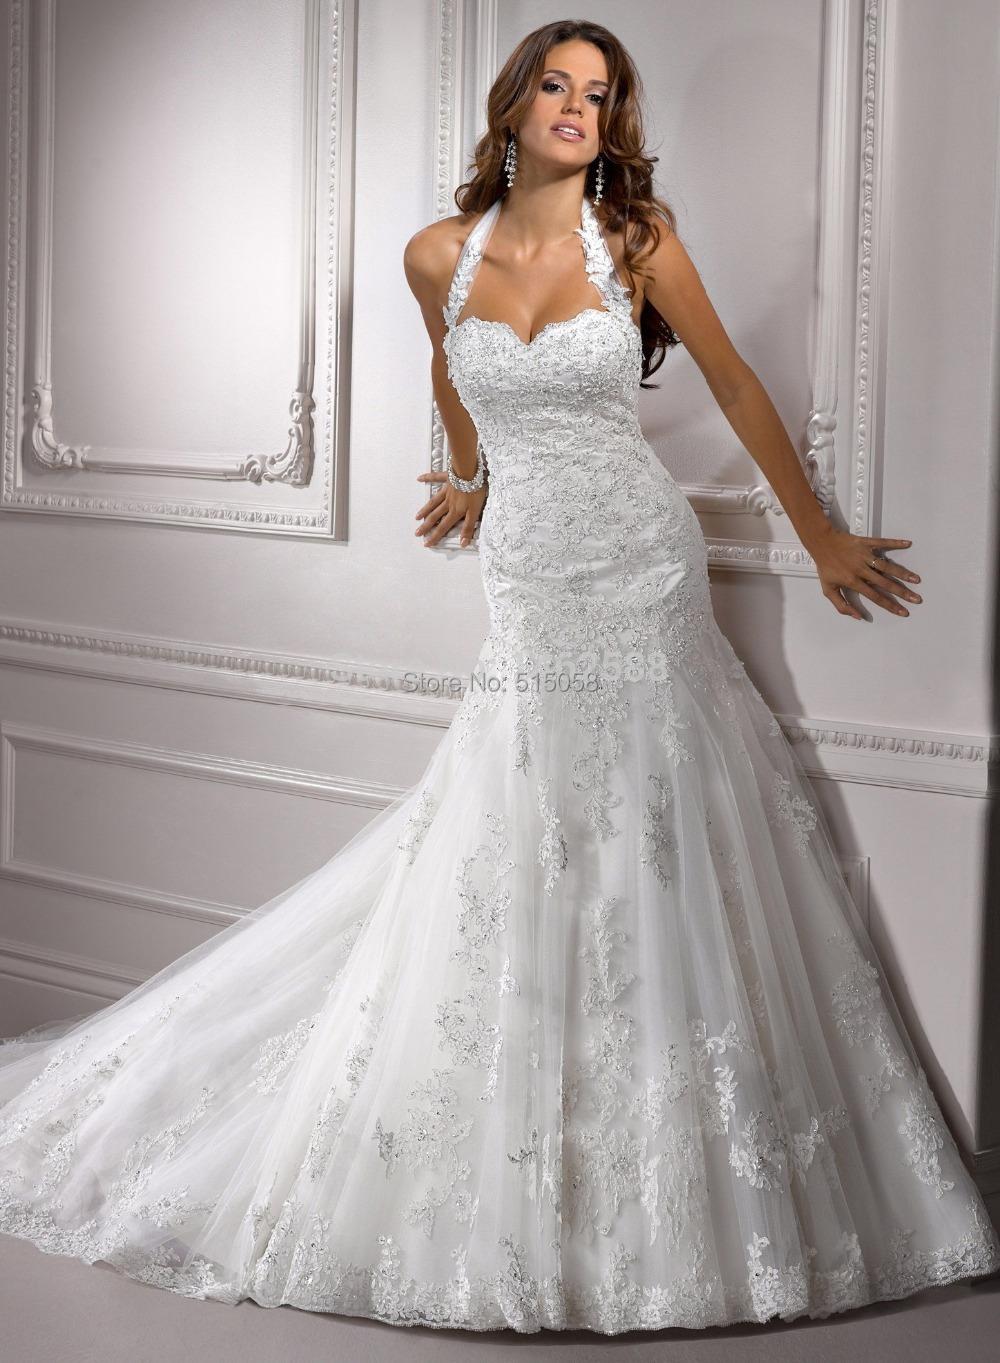 Turmec » red and white halter top wedding dresses 56707cb82